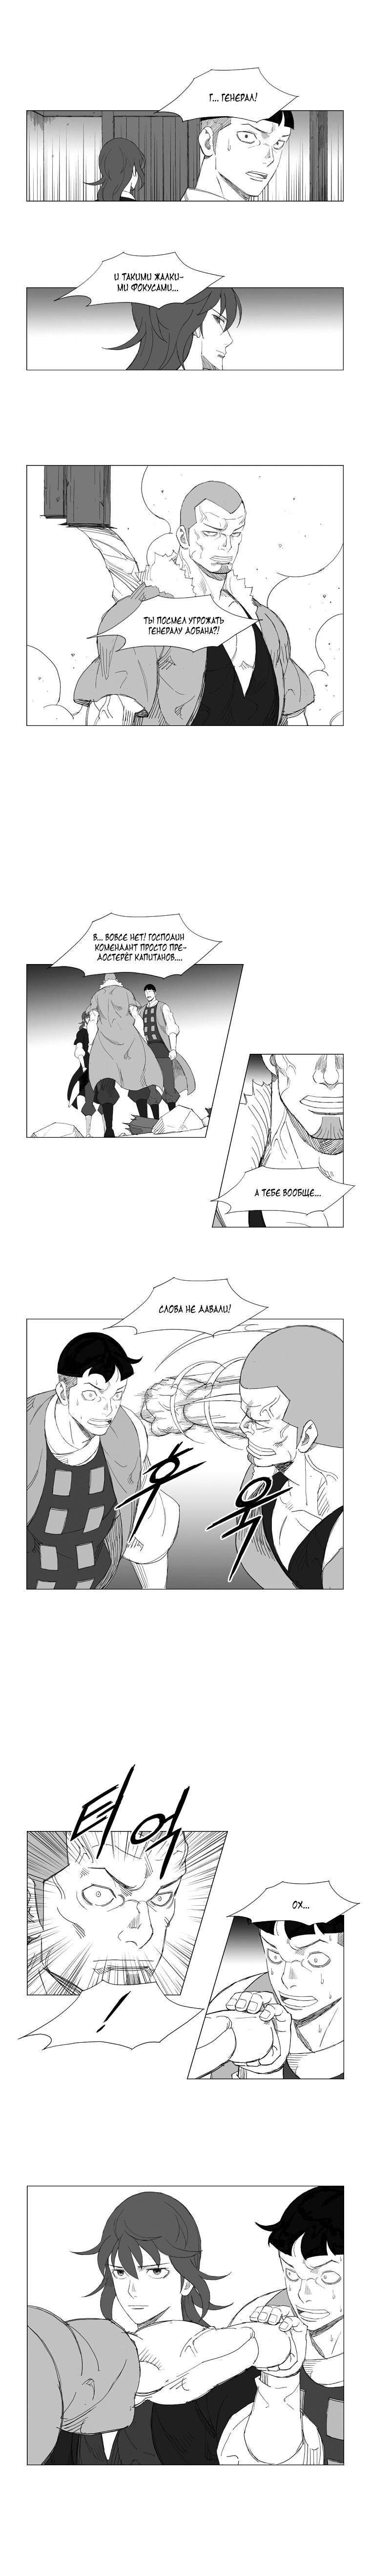 https://r1.ninemanga.com/comics/pic2/39/28263/416252/1532707583879.jpg Page 2